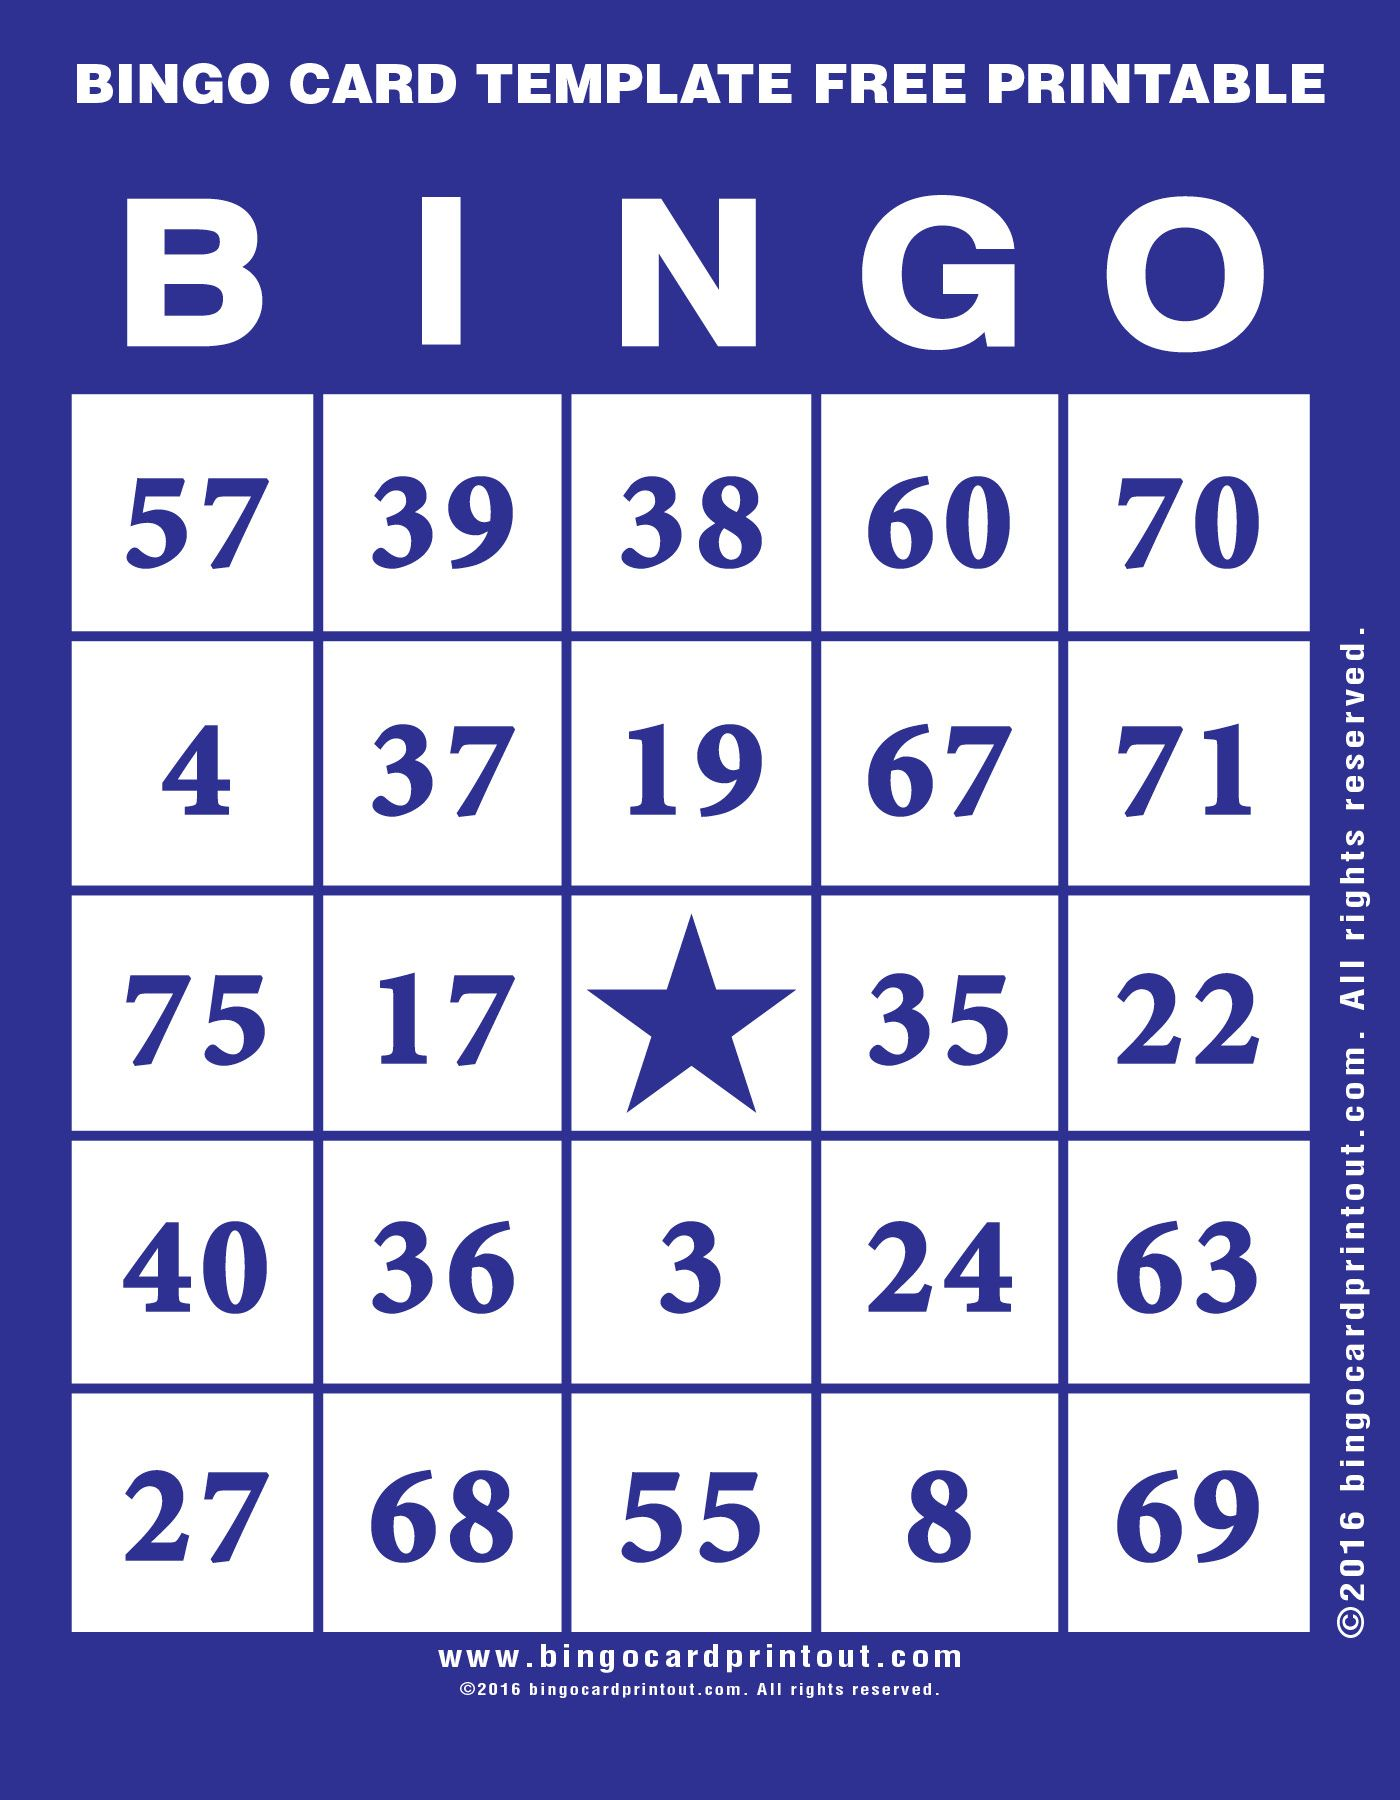 Bingo Card Template Free Printable 6 | bingo | Pinterest